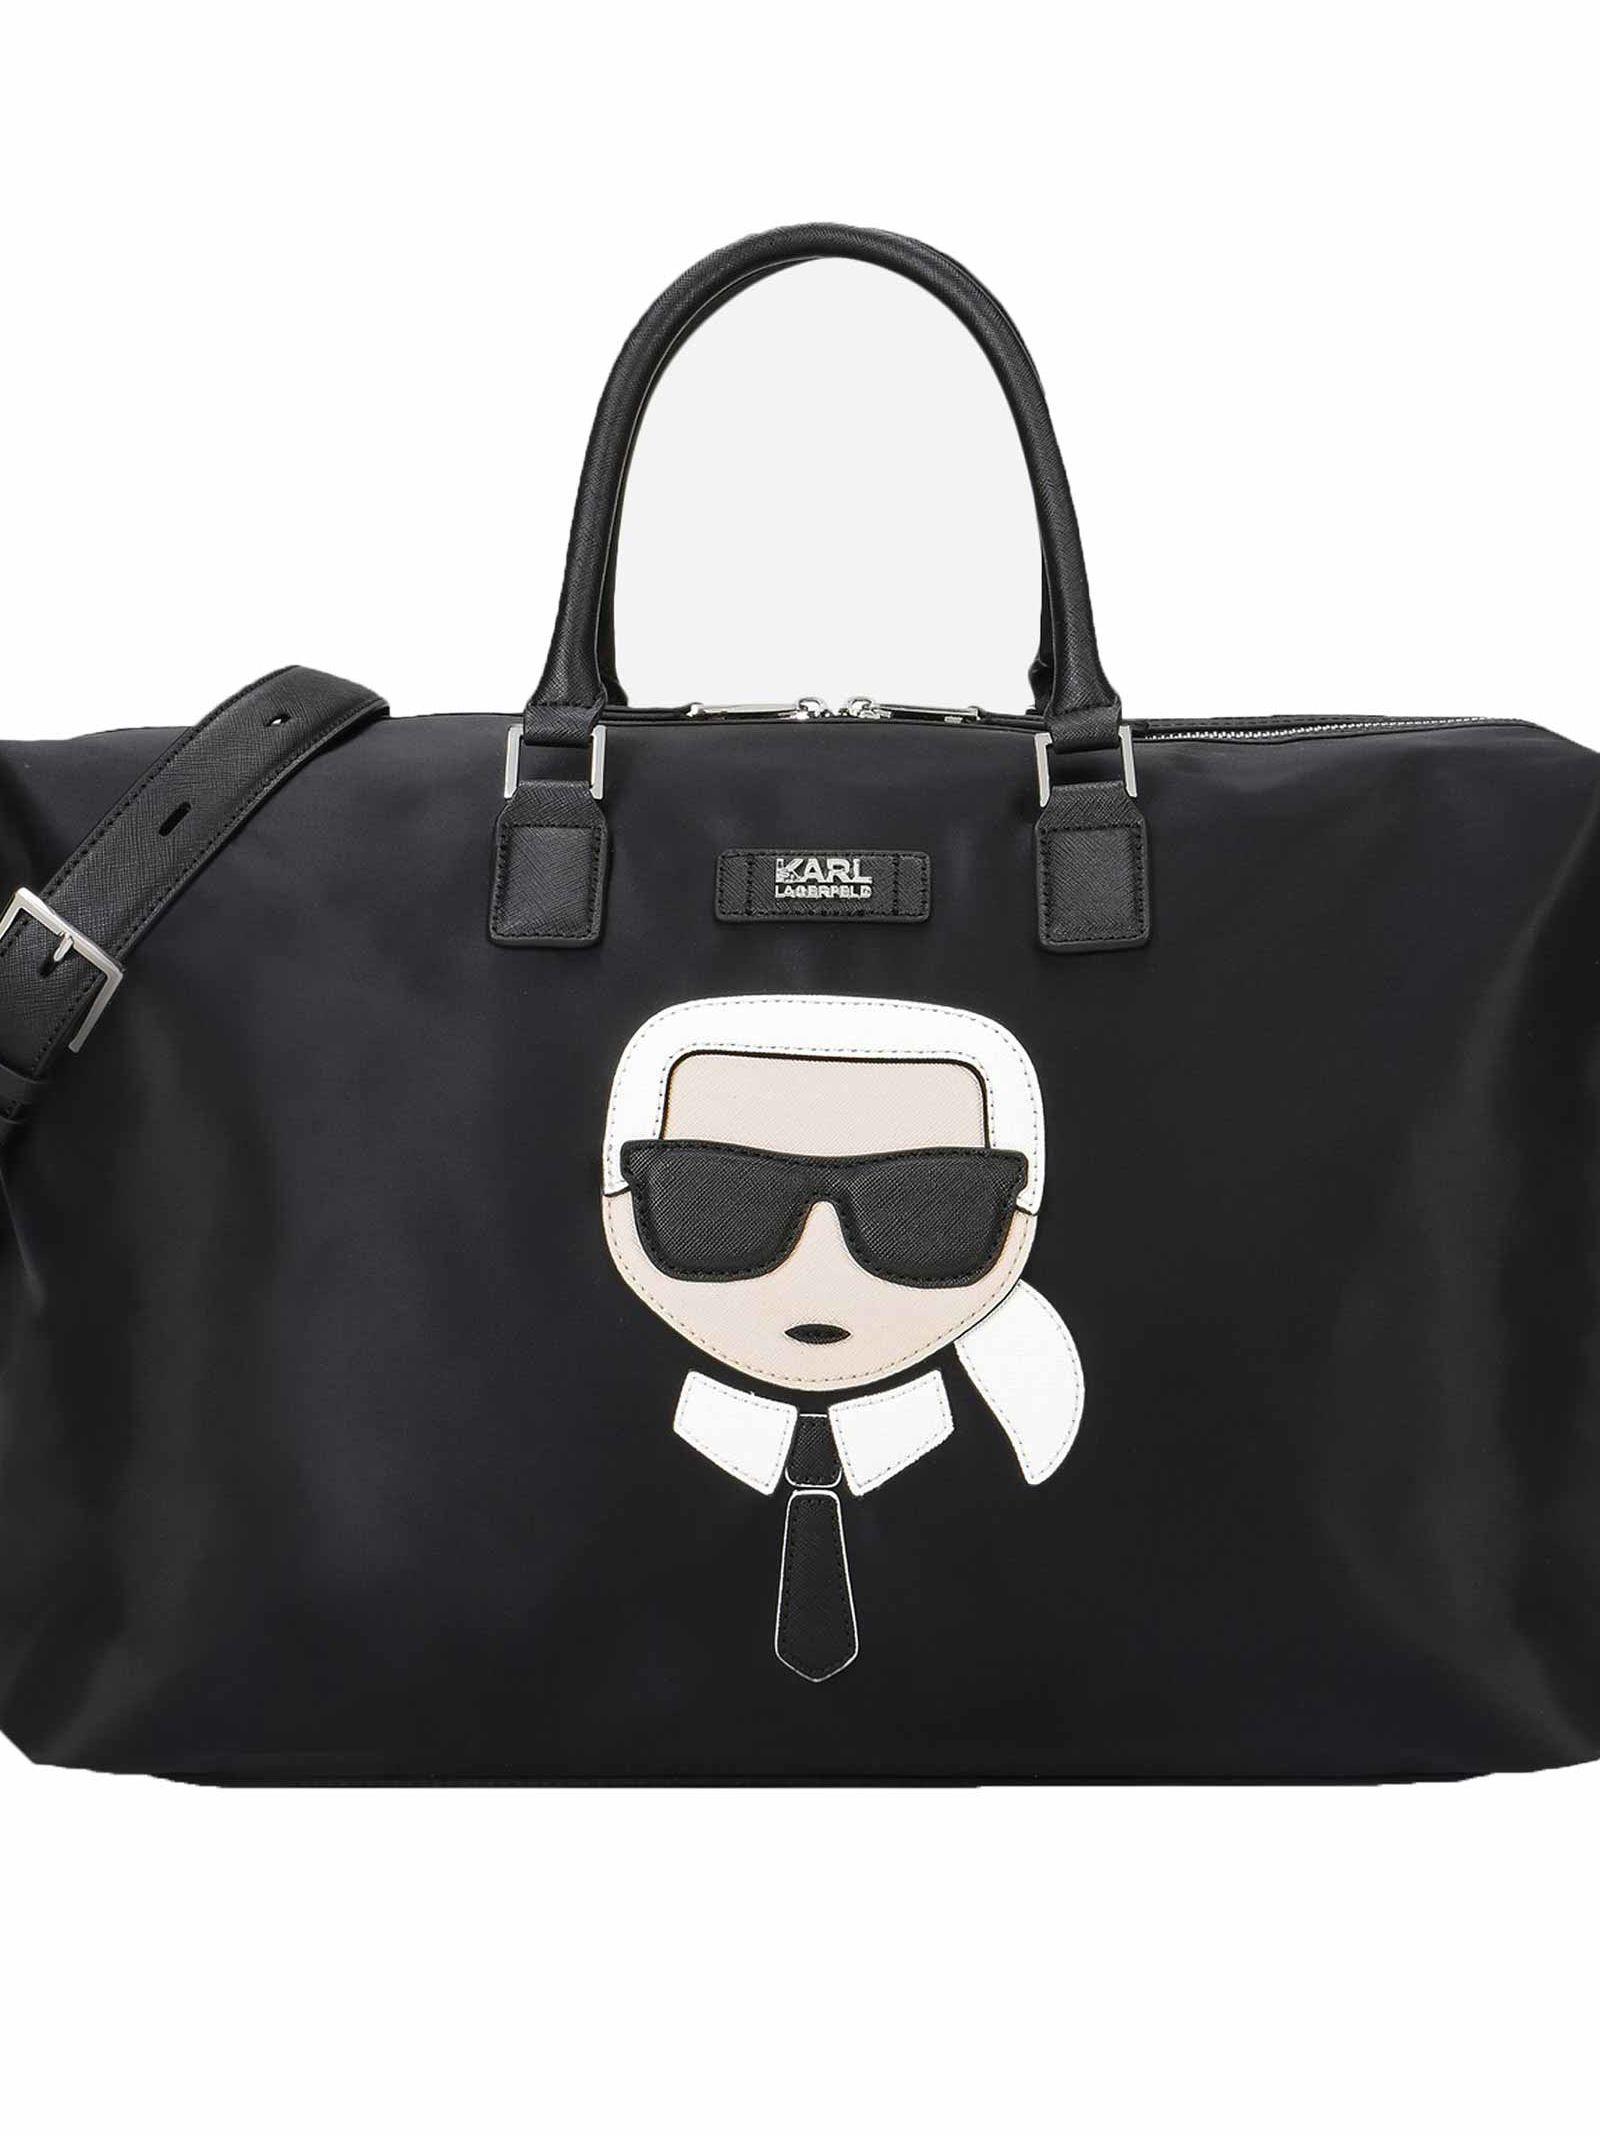 Karl Lagerfeld Ikonik Duffle Bag